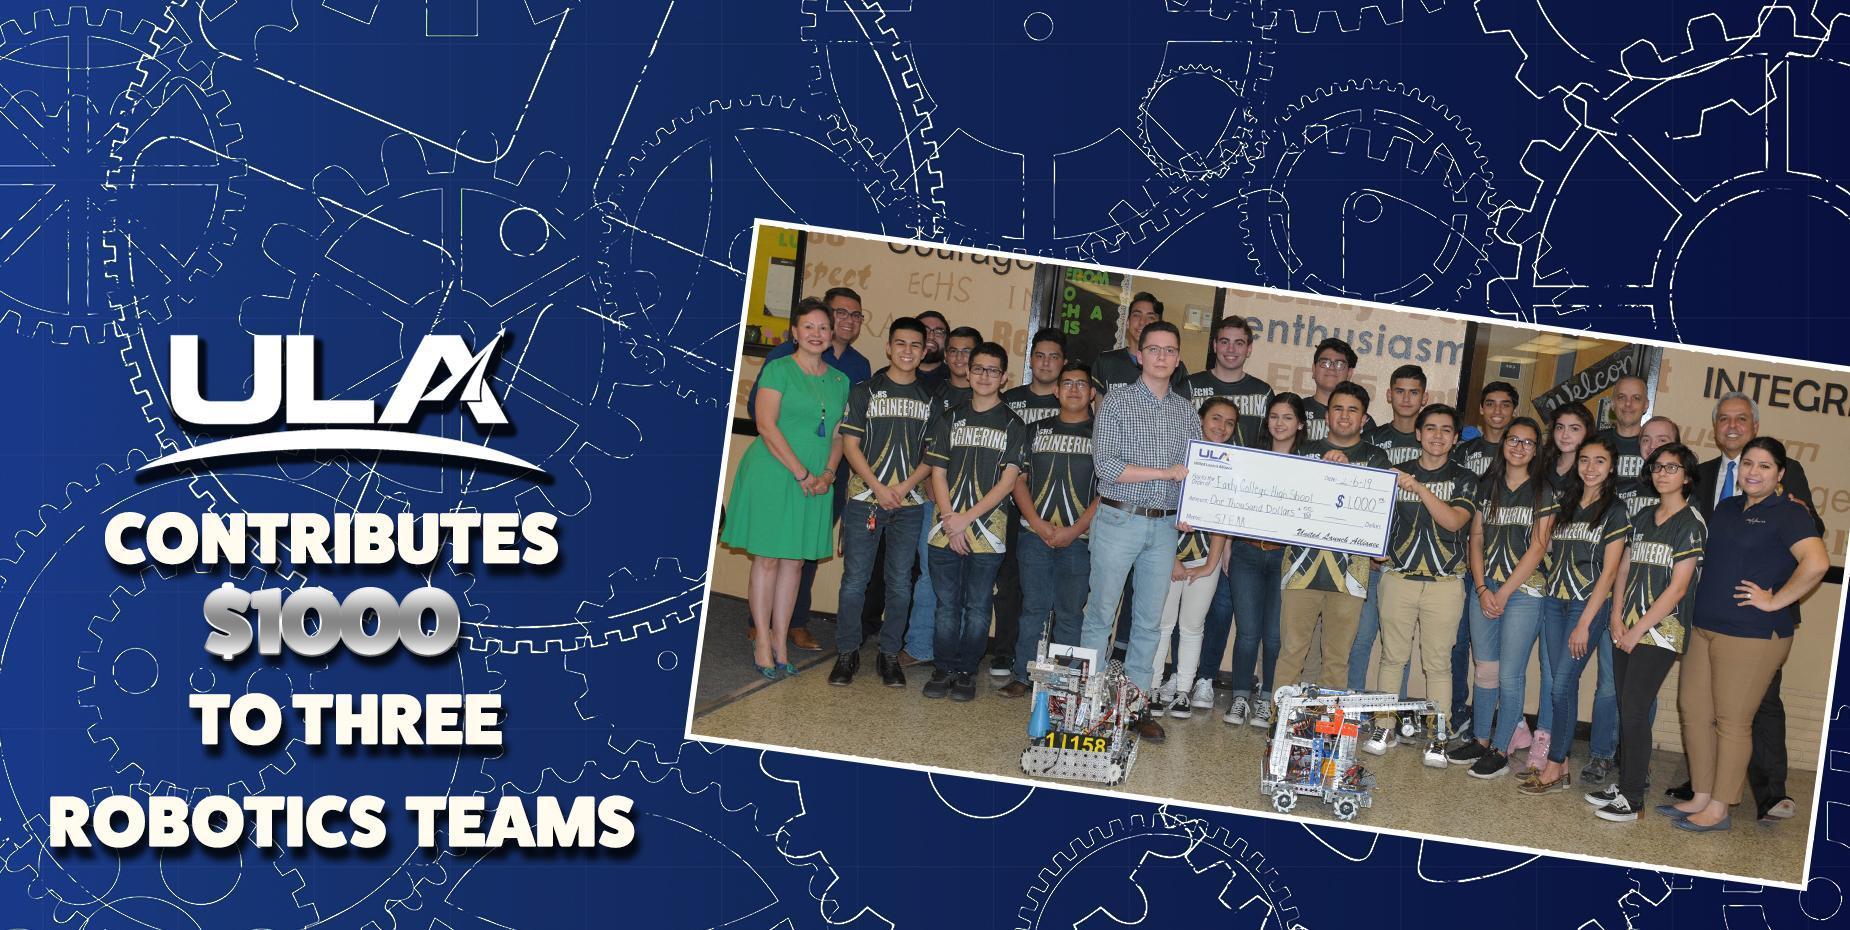 ULA Contributes 1K to 3 Robotics Teams